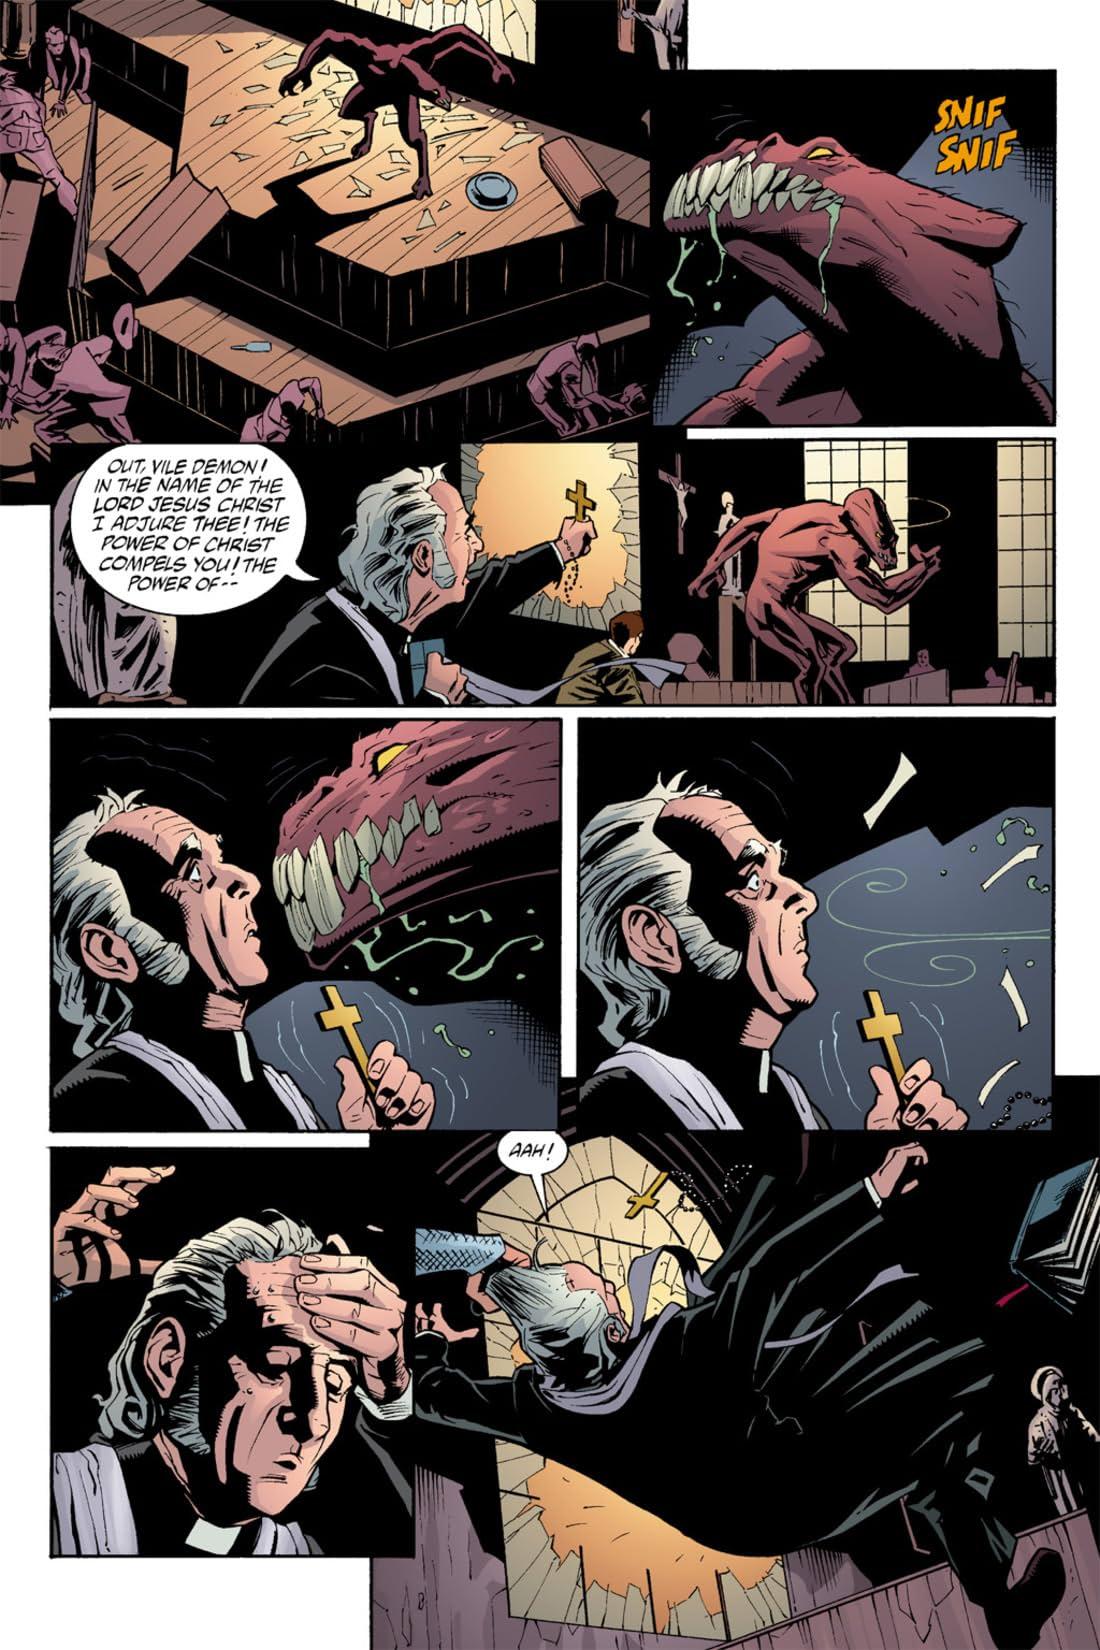 Buffy the Vampire Slayer Classic #32: Heart of a Slayer